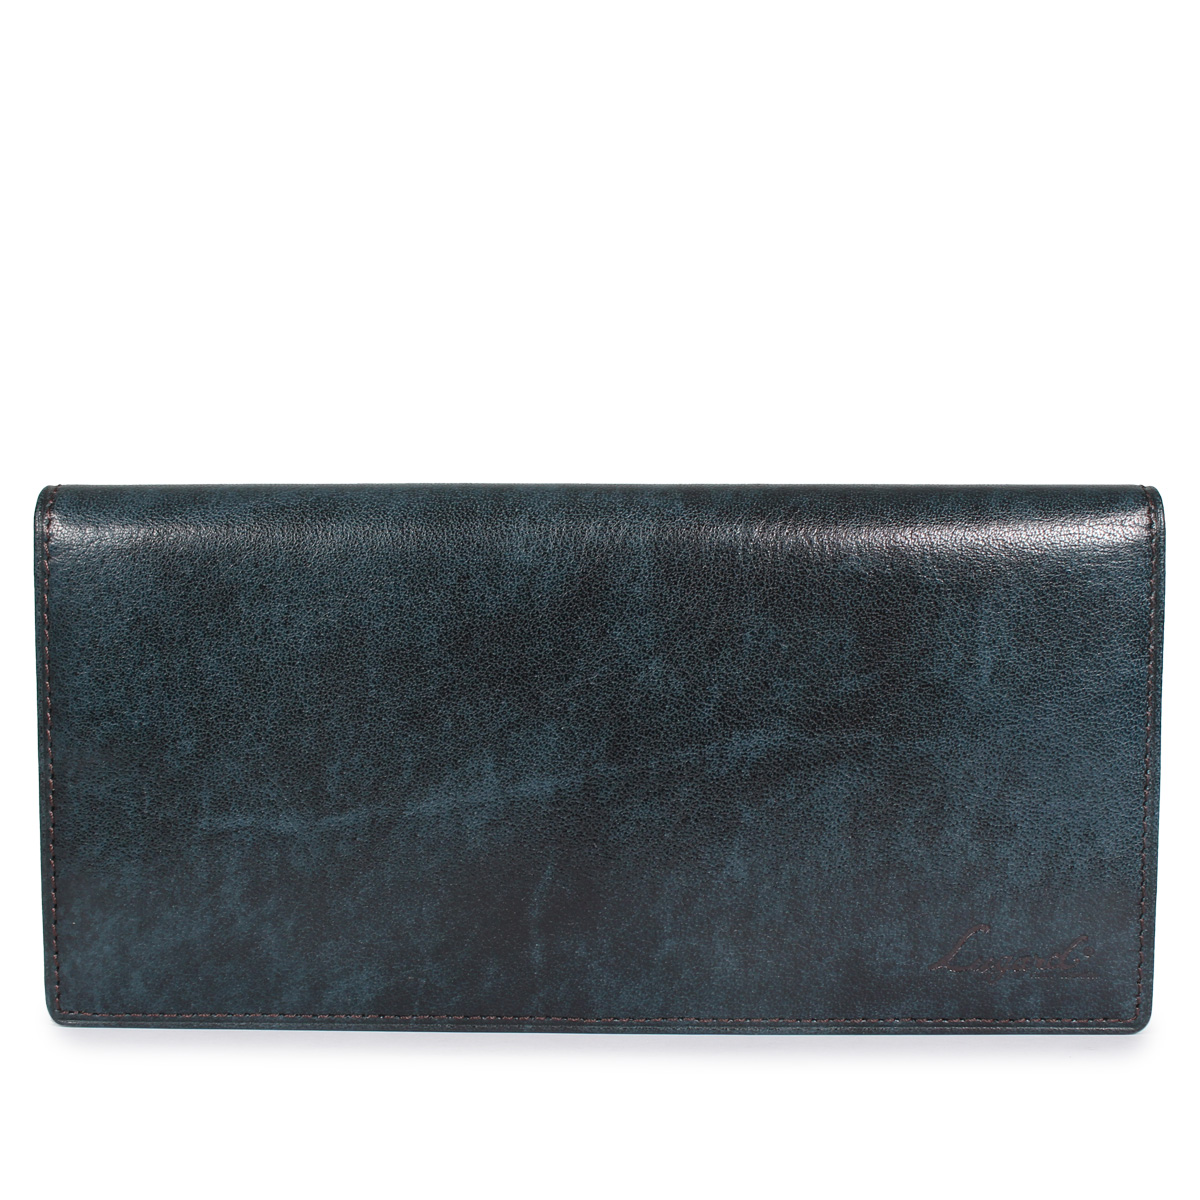 Lugard G3 WALLET ラガード 青木鞄 ジースリー 財布 長財布 二つ折り メンズ ブラック ネイビー ブラウン 黒 5188